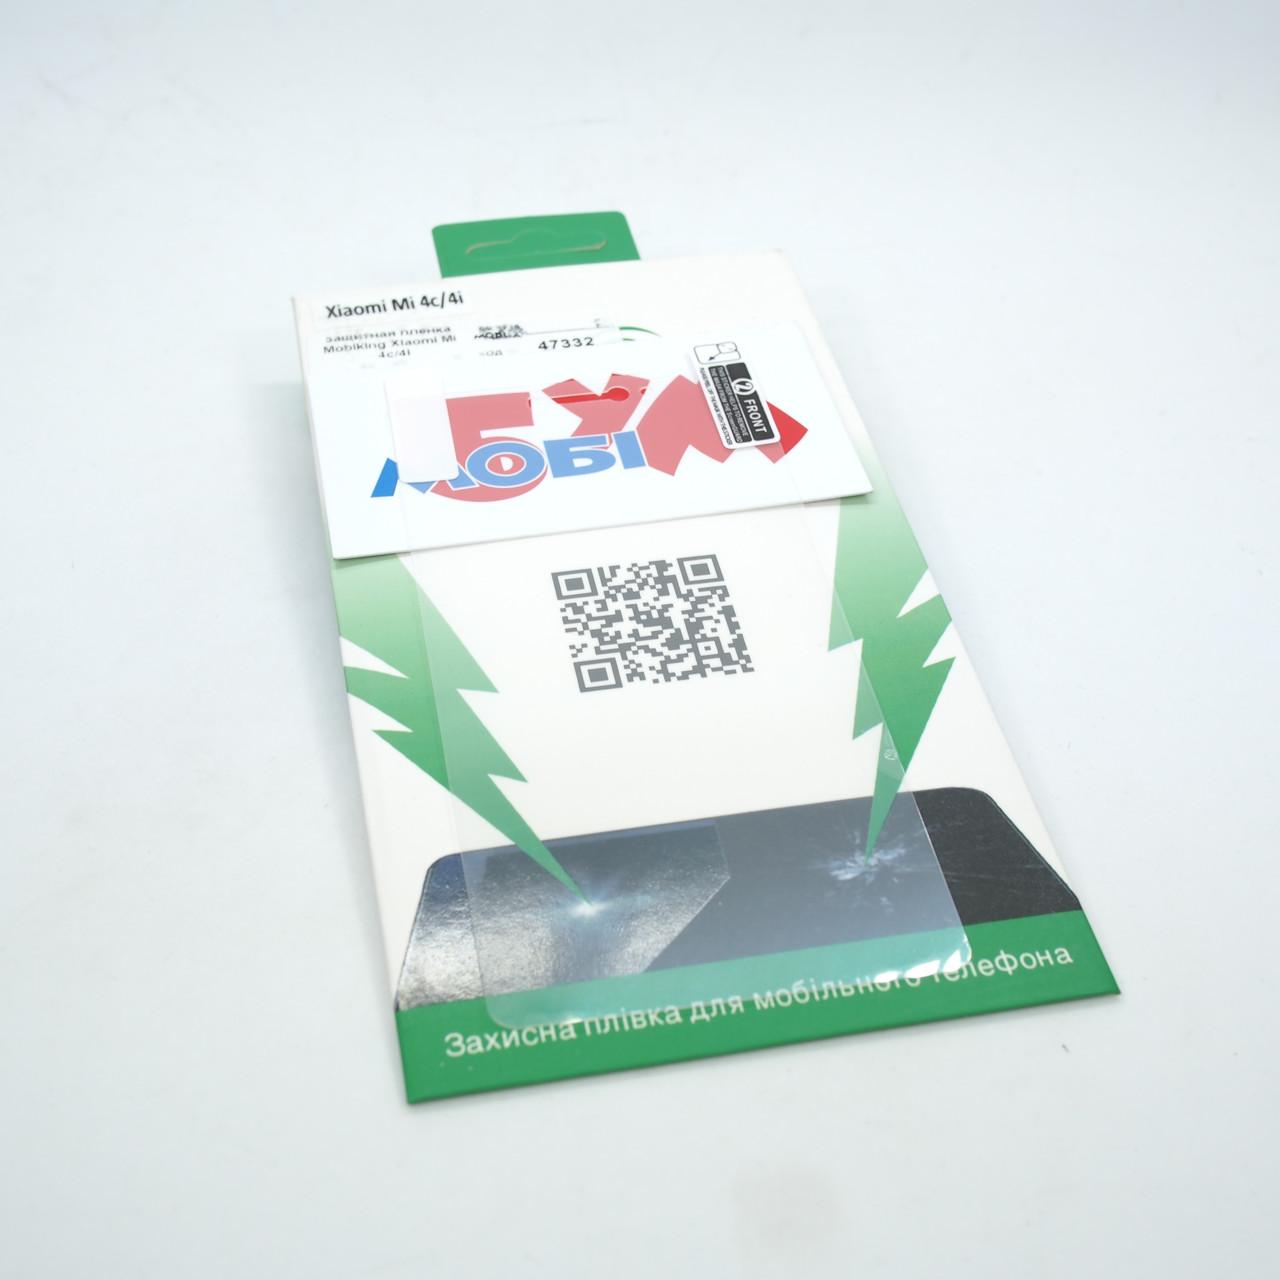 Защитная пленка Mobiking Xiaomi Mi 4c 4i